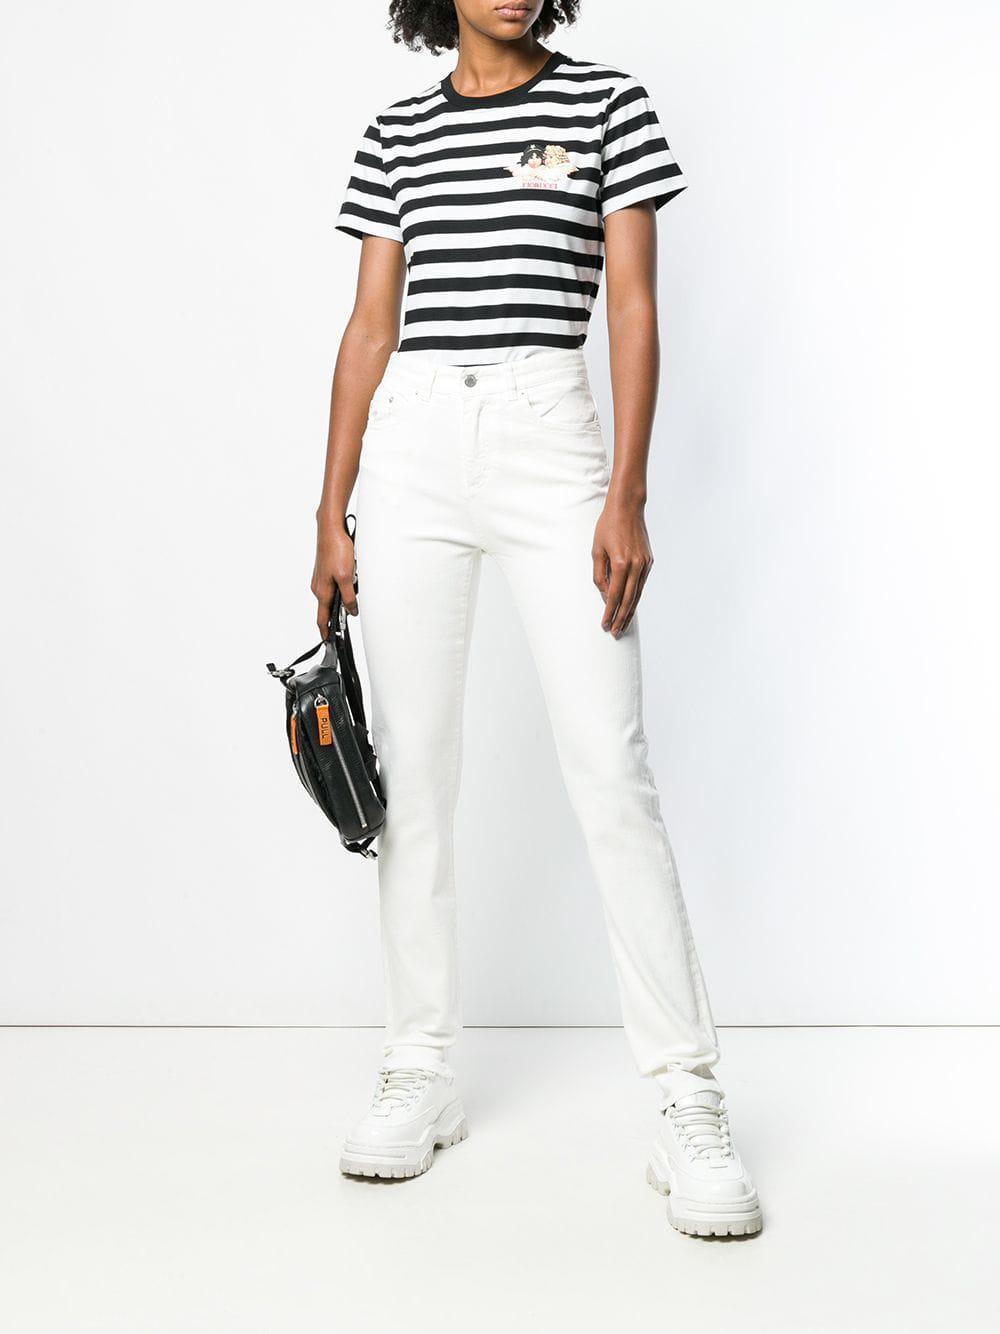 5143398f56e Lyst - Fiorucci Striped Logo T-shirt in Black